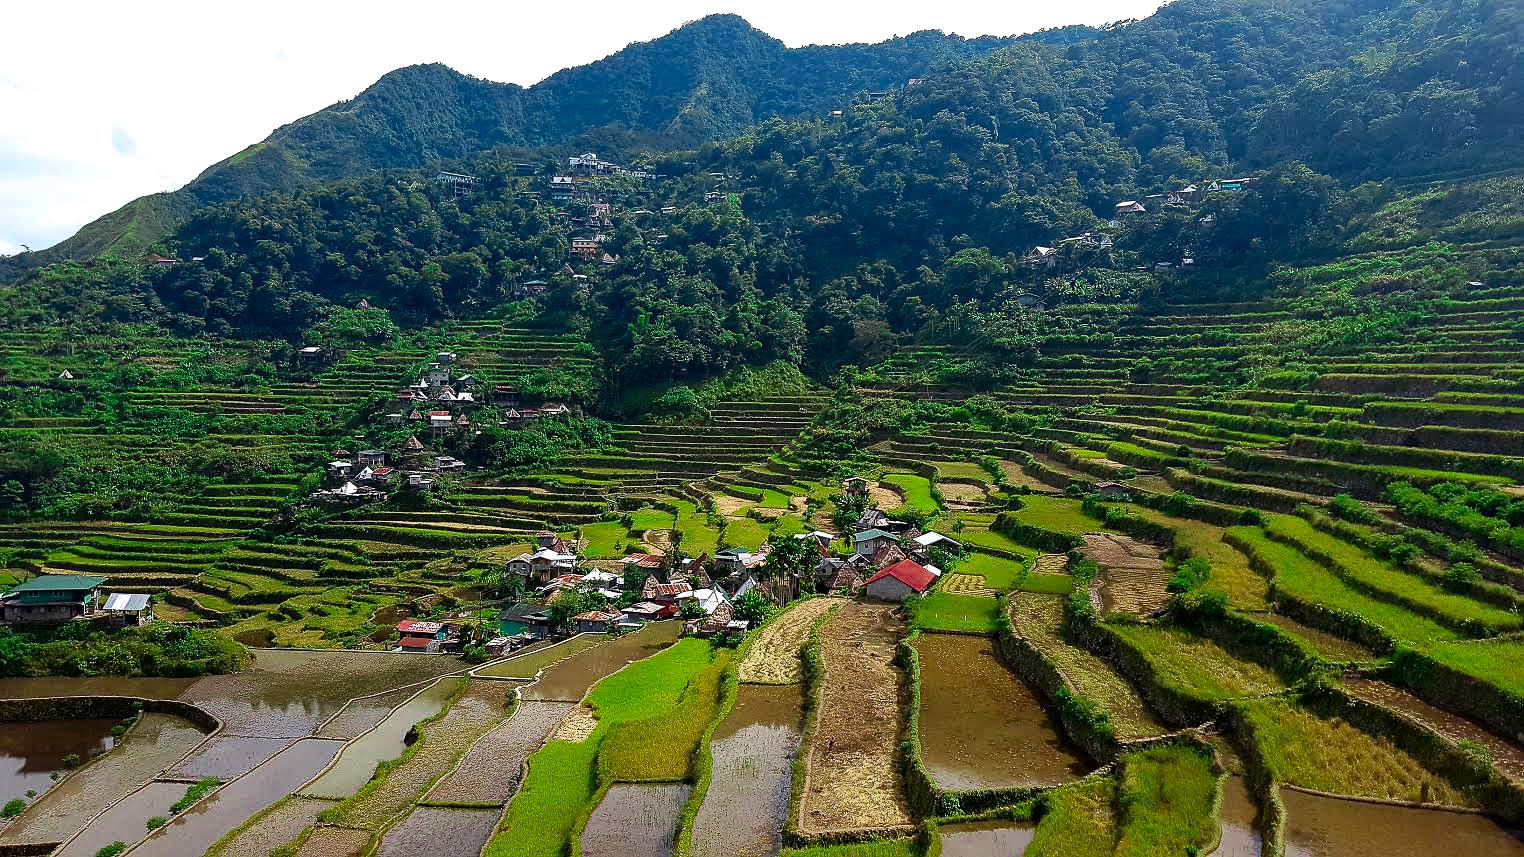 The steep, green rice terraces of Batad